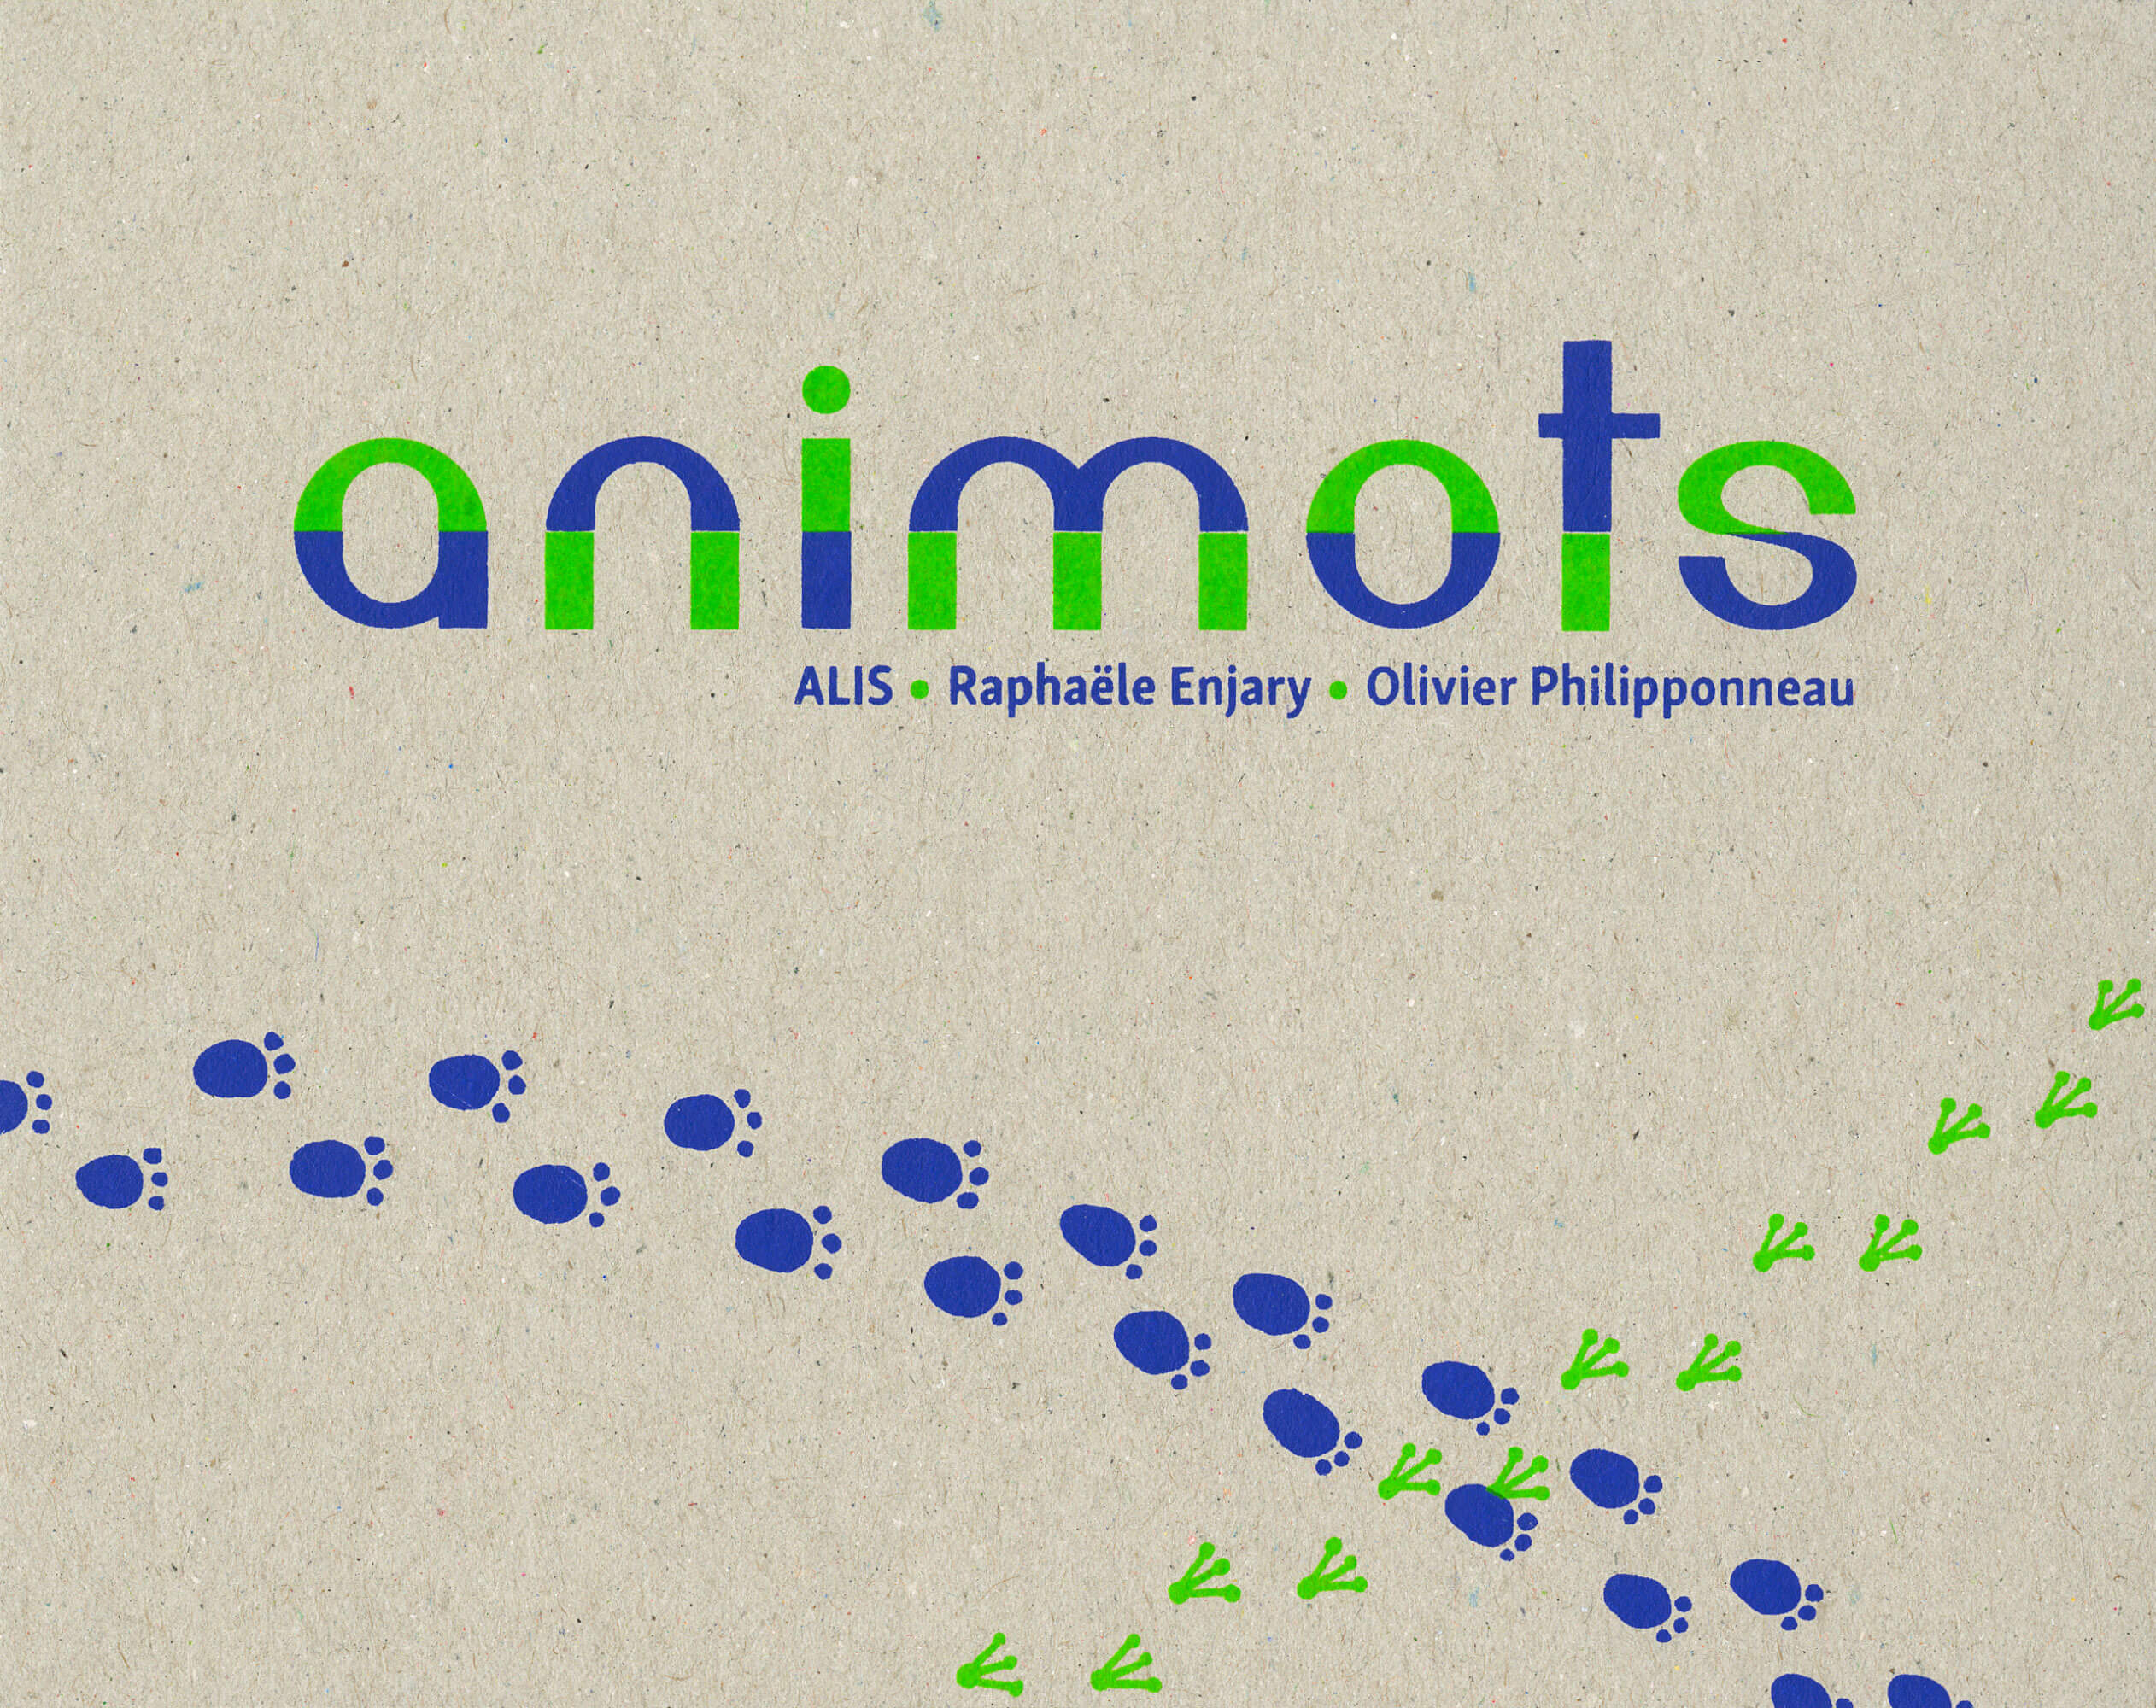 biblio_animots